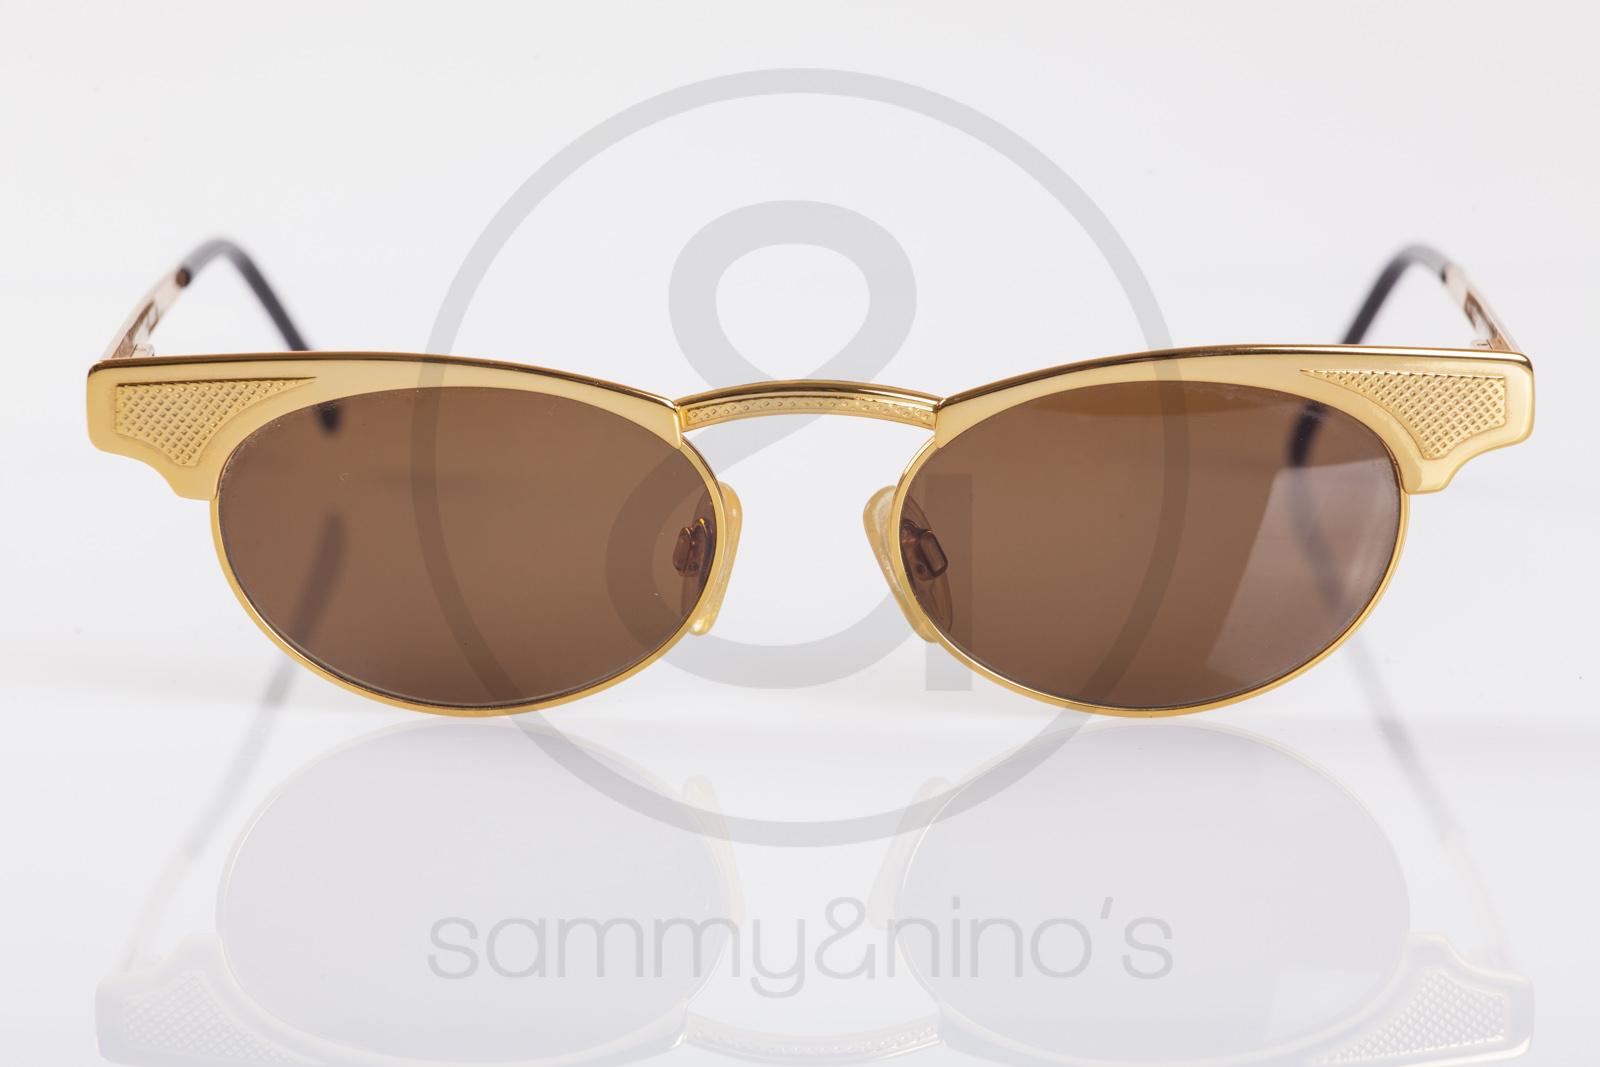 Ferre Sunglasses  gianfranco ferré gff 86 s sammy nino s